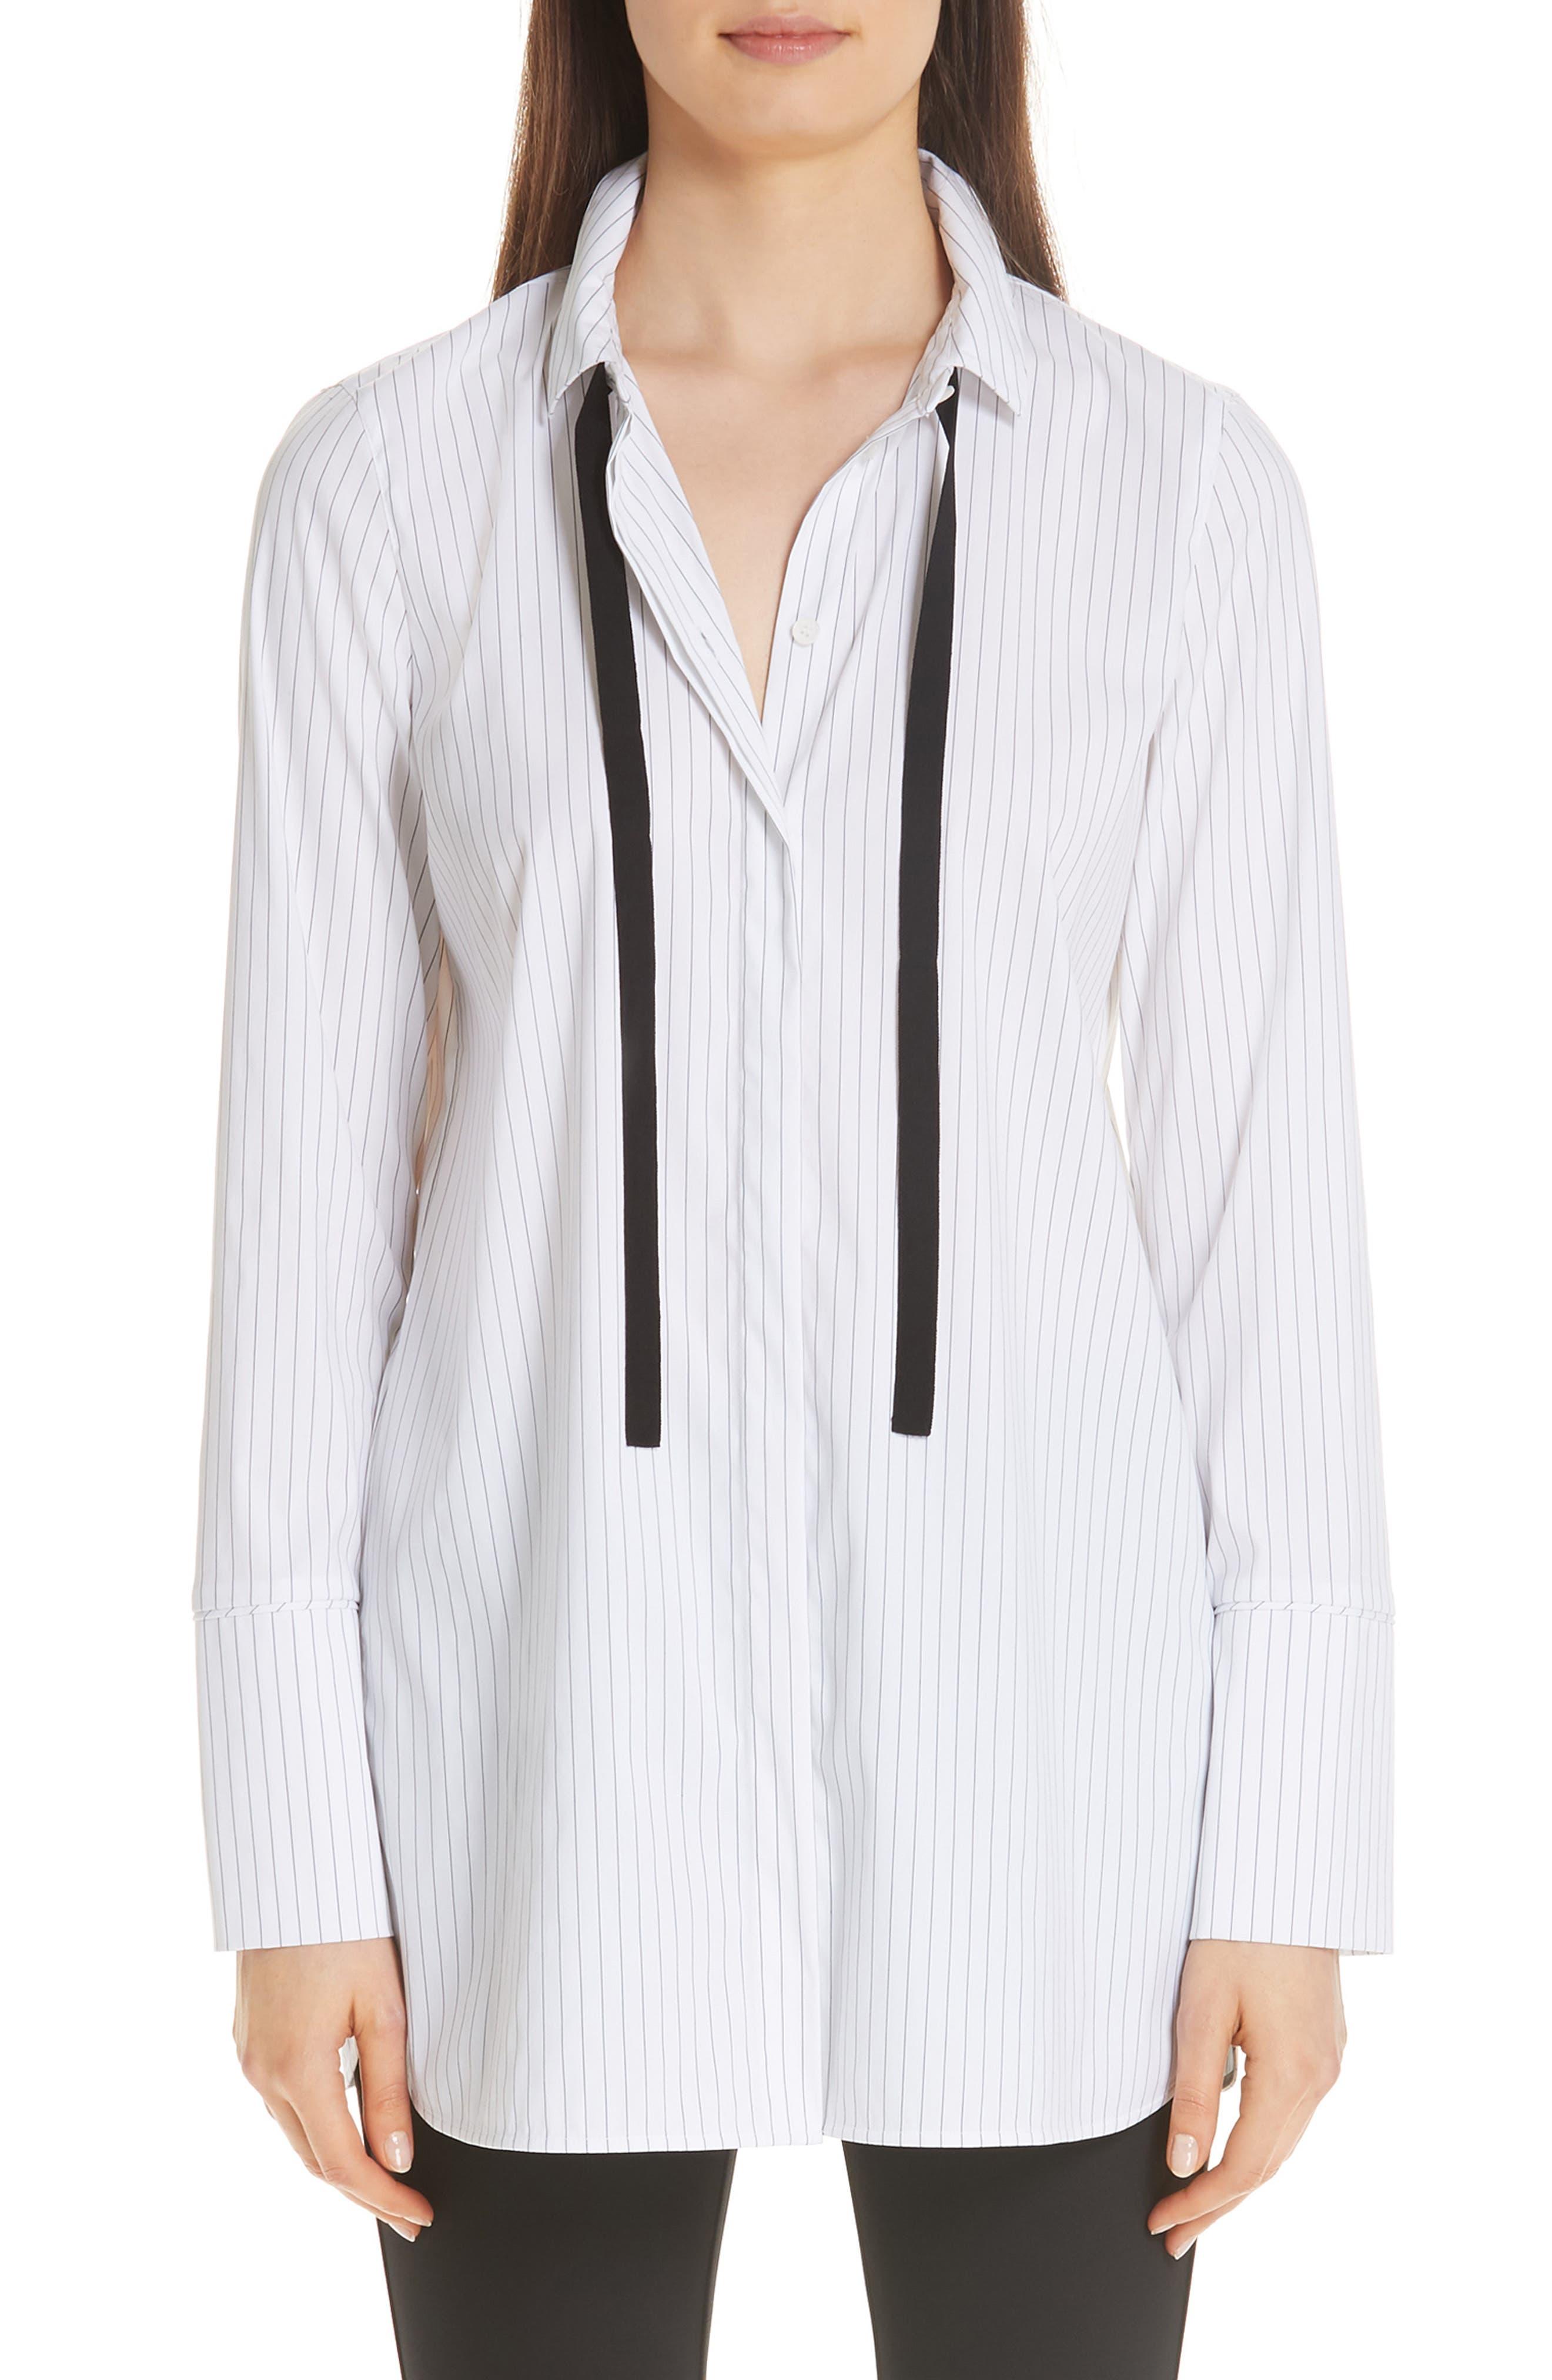 Annaleise Contrast Tie Stanford Stripe Blouse,                             Main thumbnail 1, color,                             BLACK MULTI